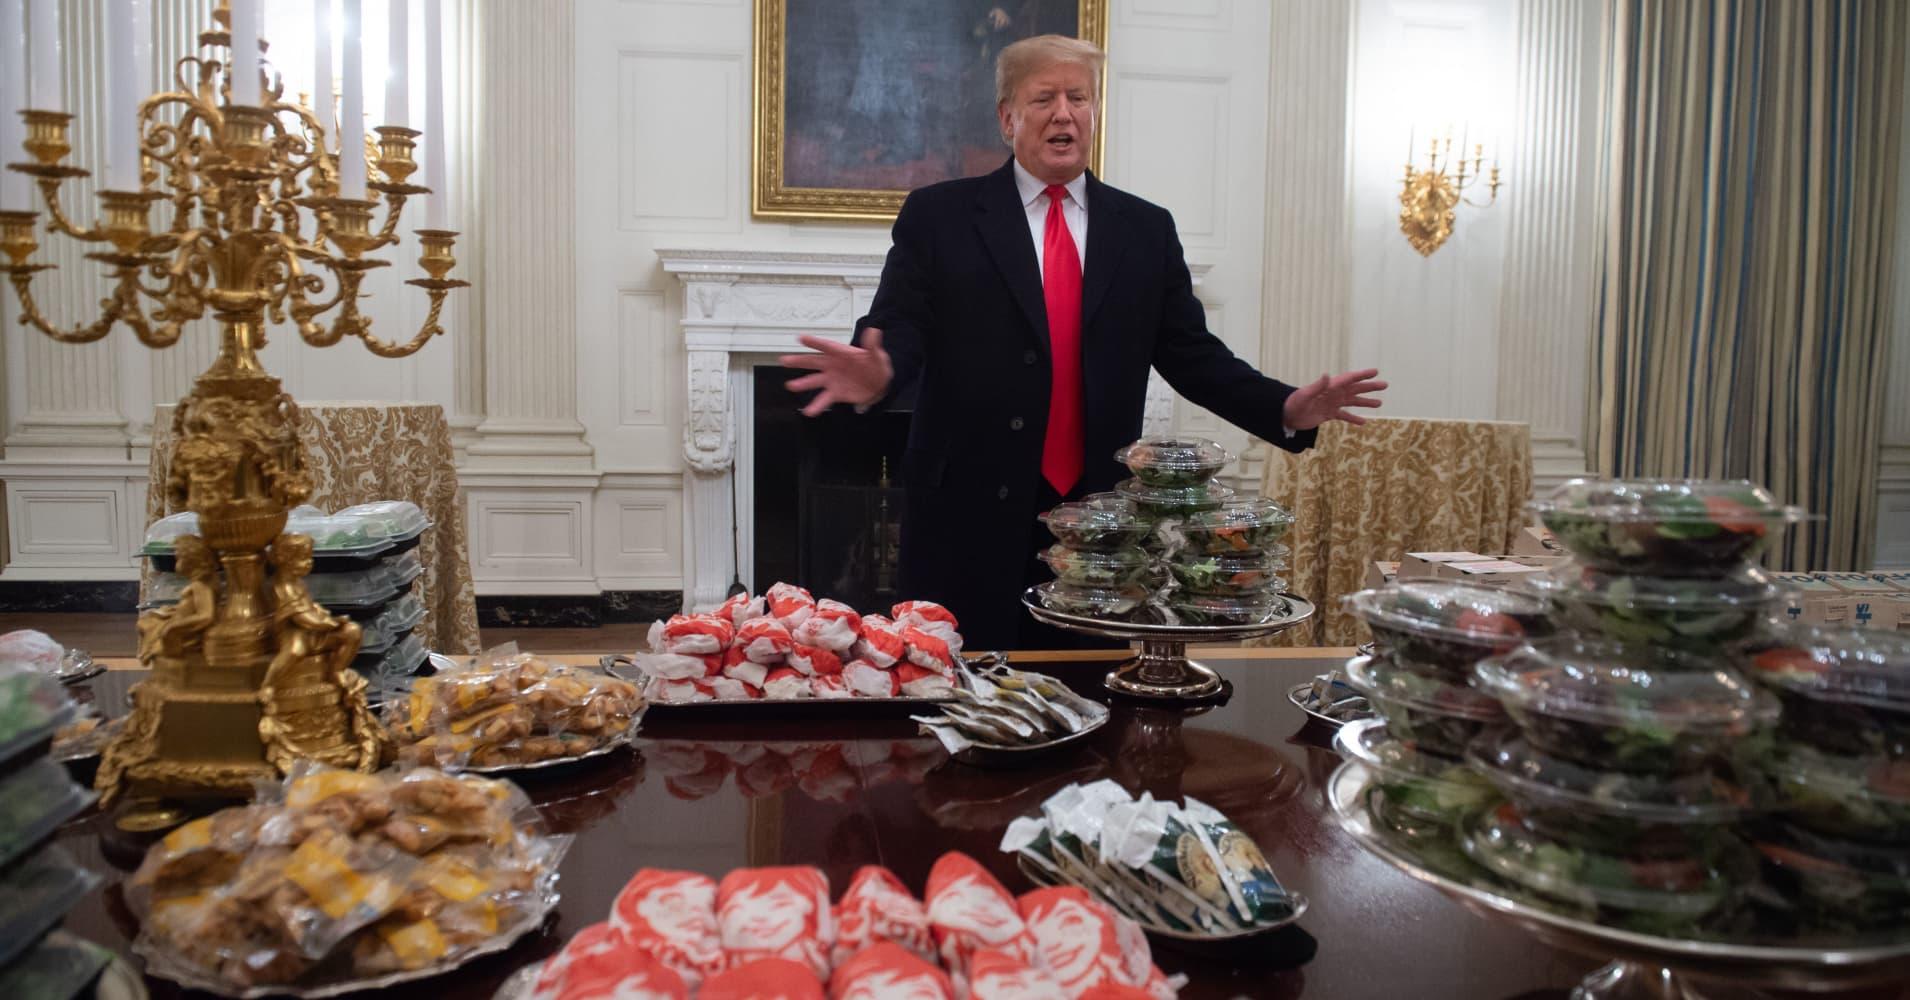 Clemson Tigers get invite to Alinea after Trump dinner